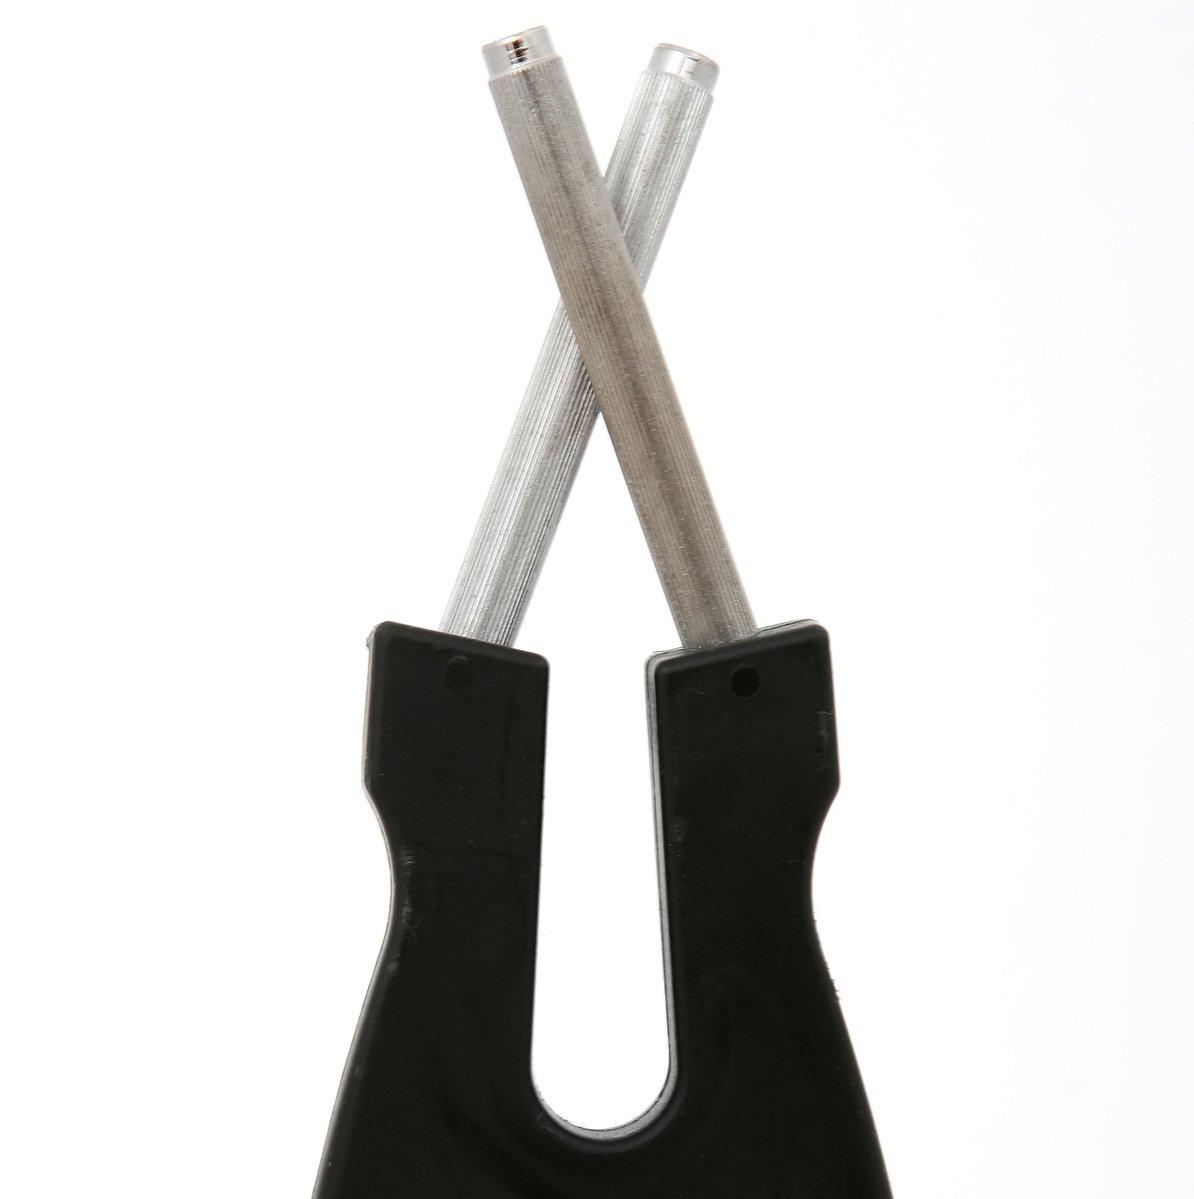 free kitchen chefs tool knife sharpener stock photo. Black Bedroom Furniture Sets. Home Design Ideas